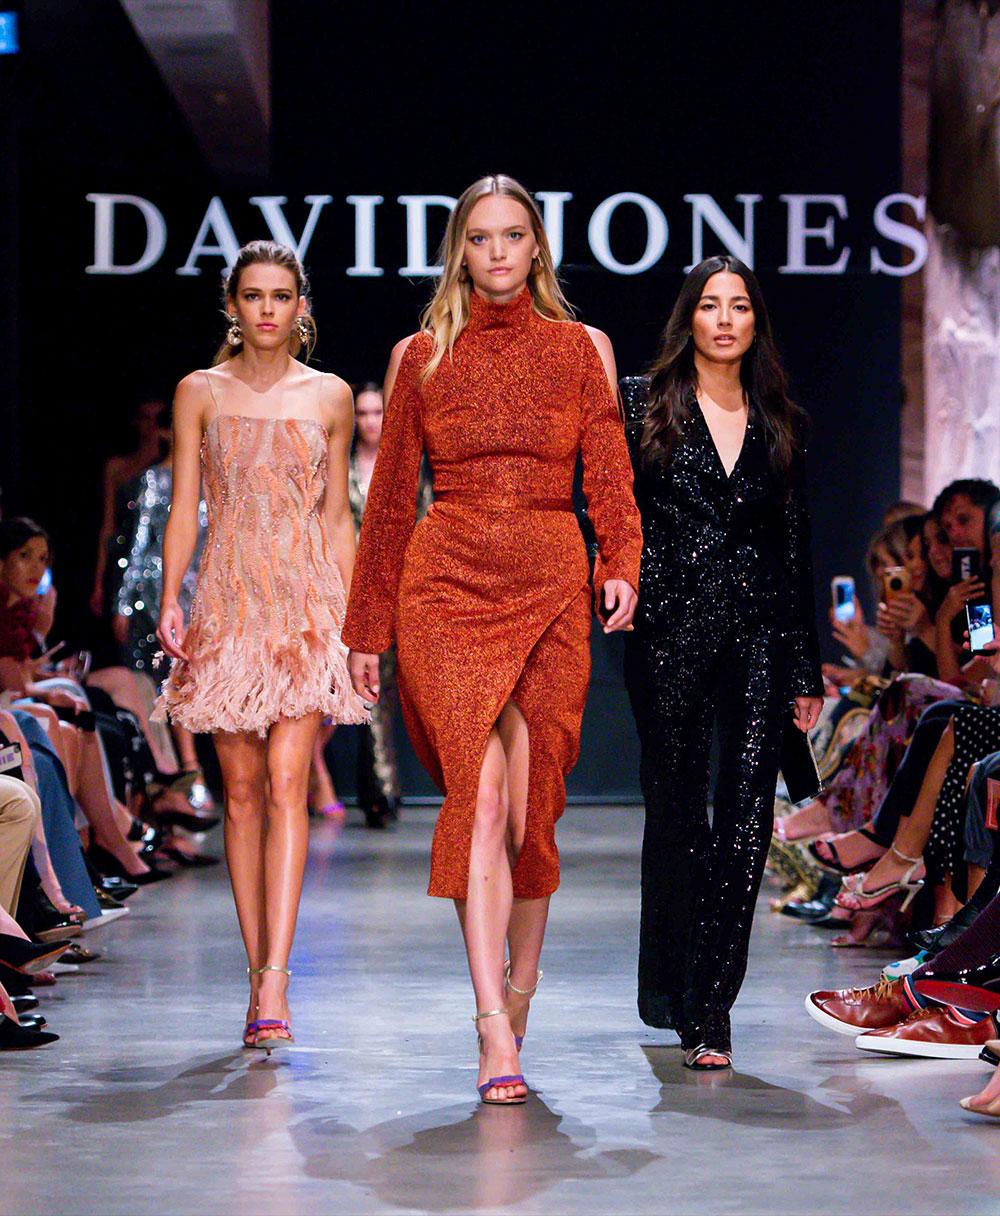 60e16ce39fd David Jones New Season AW19 Collection Launch | JONES